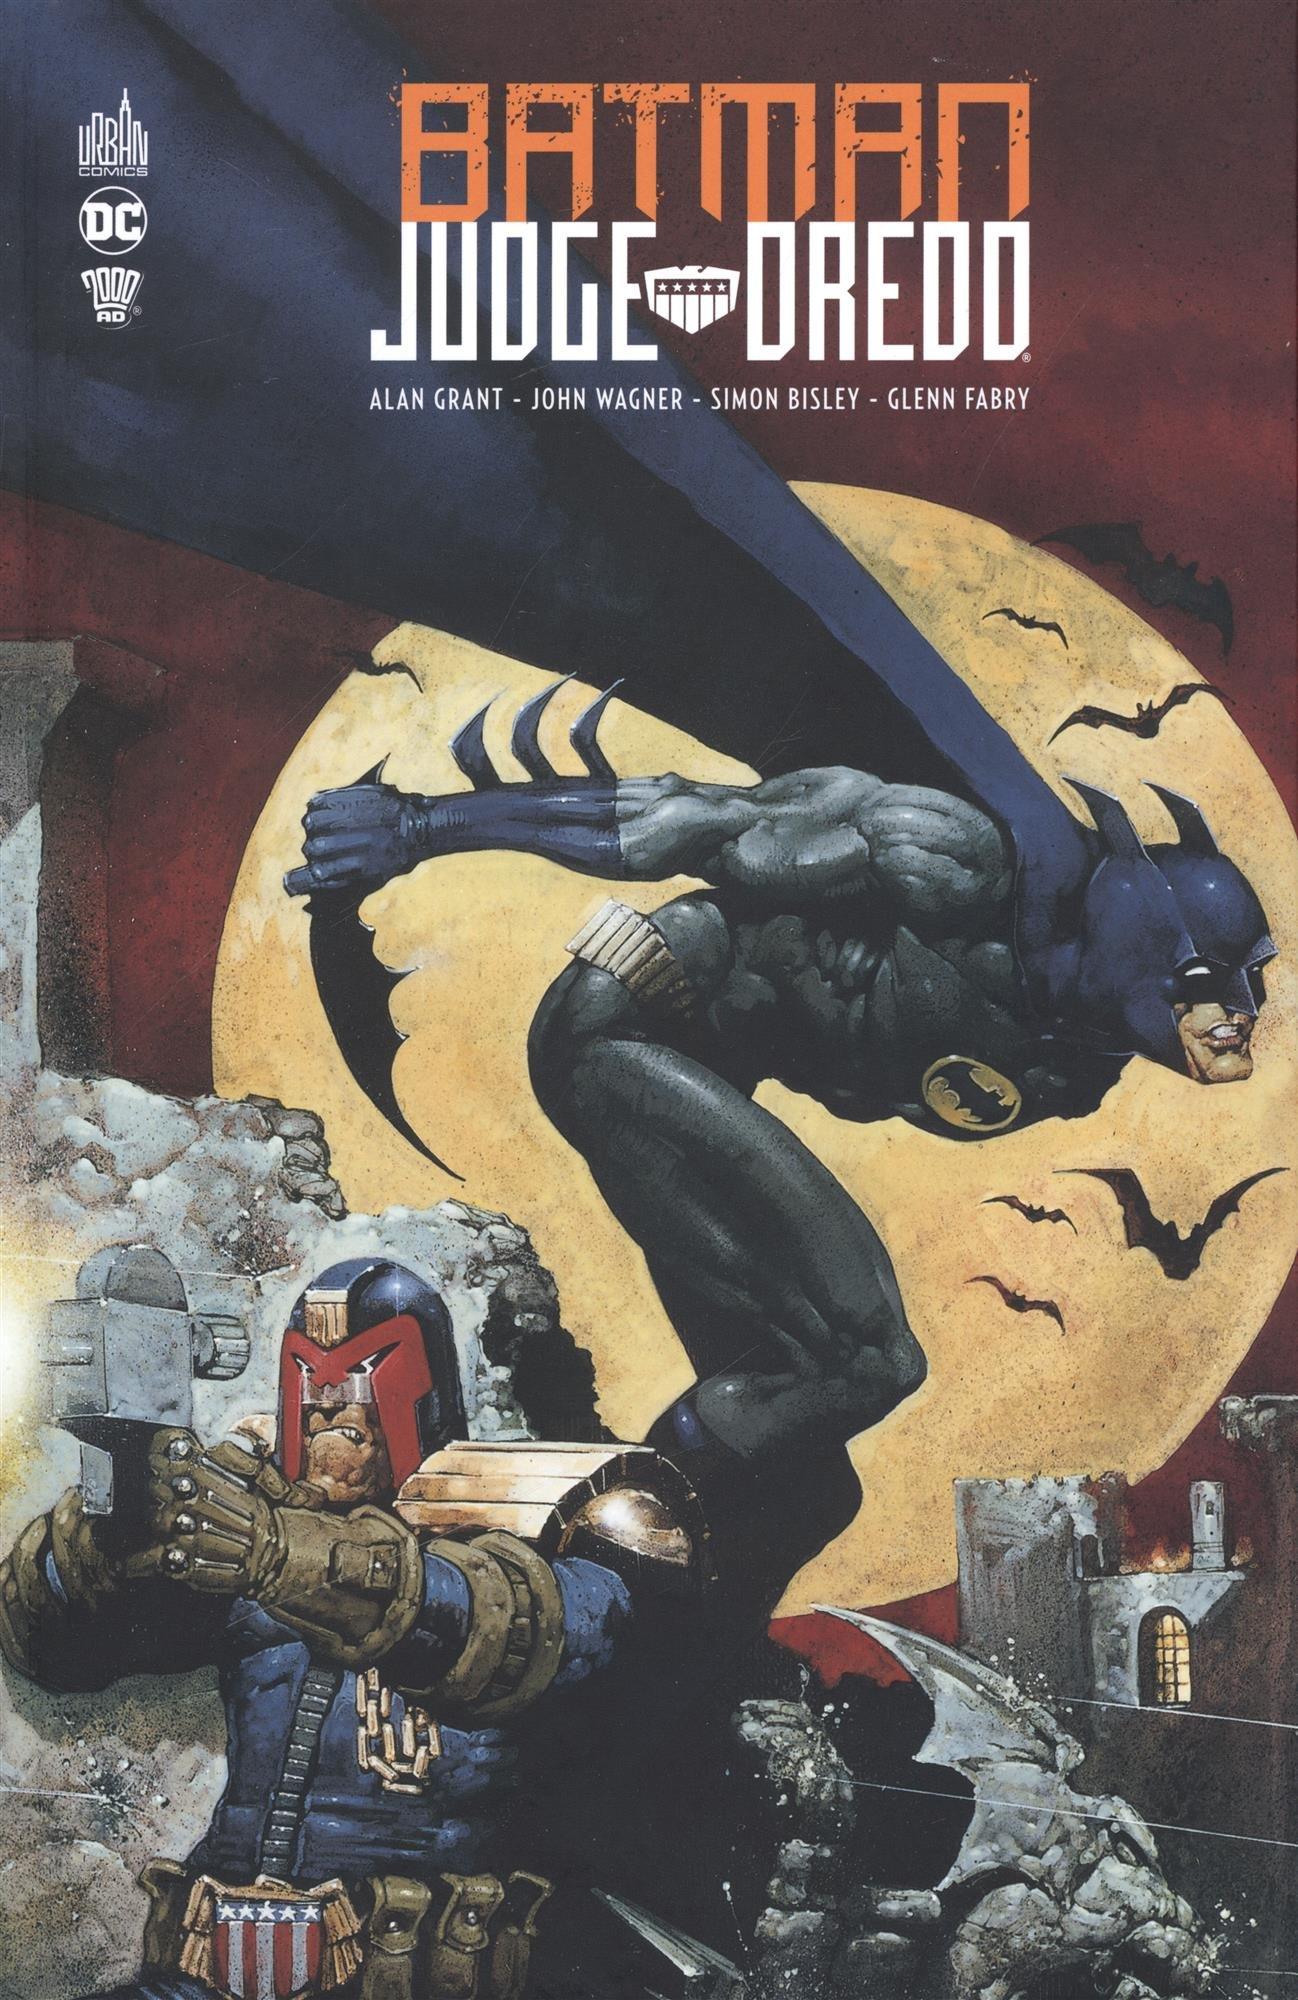 Batman Judge Dredd  Amazon.co.uk  Simon Bisley e18b0a623c4